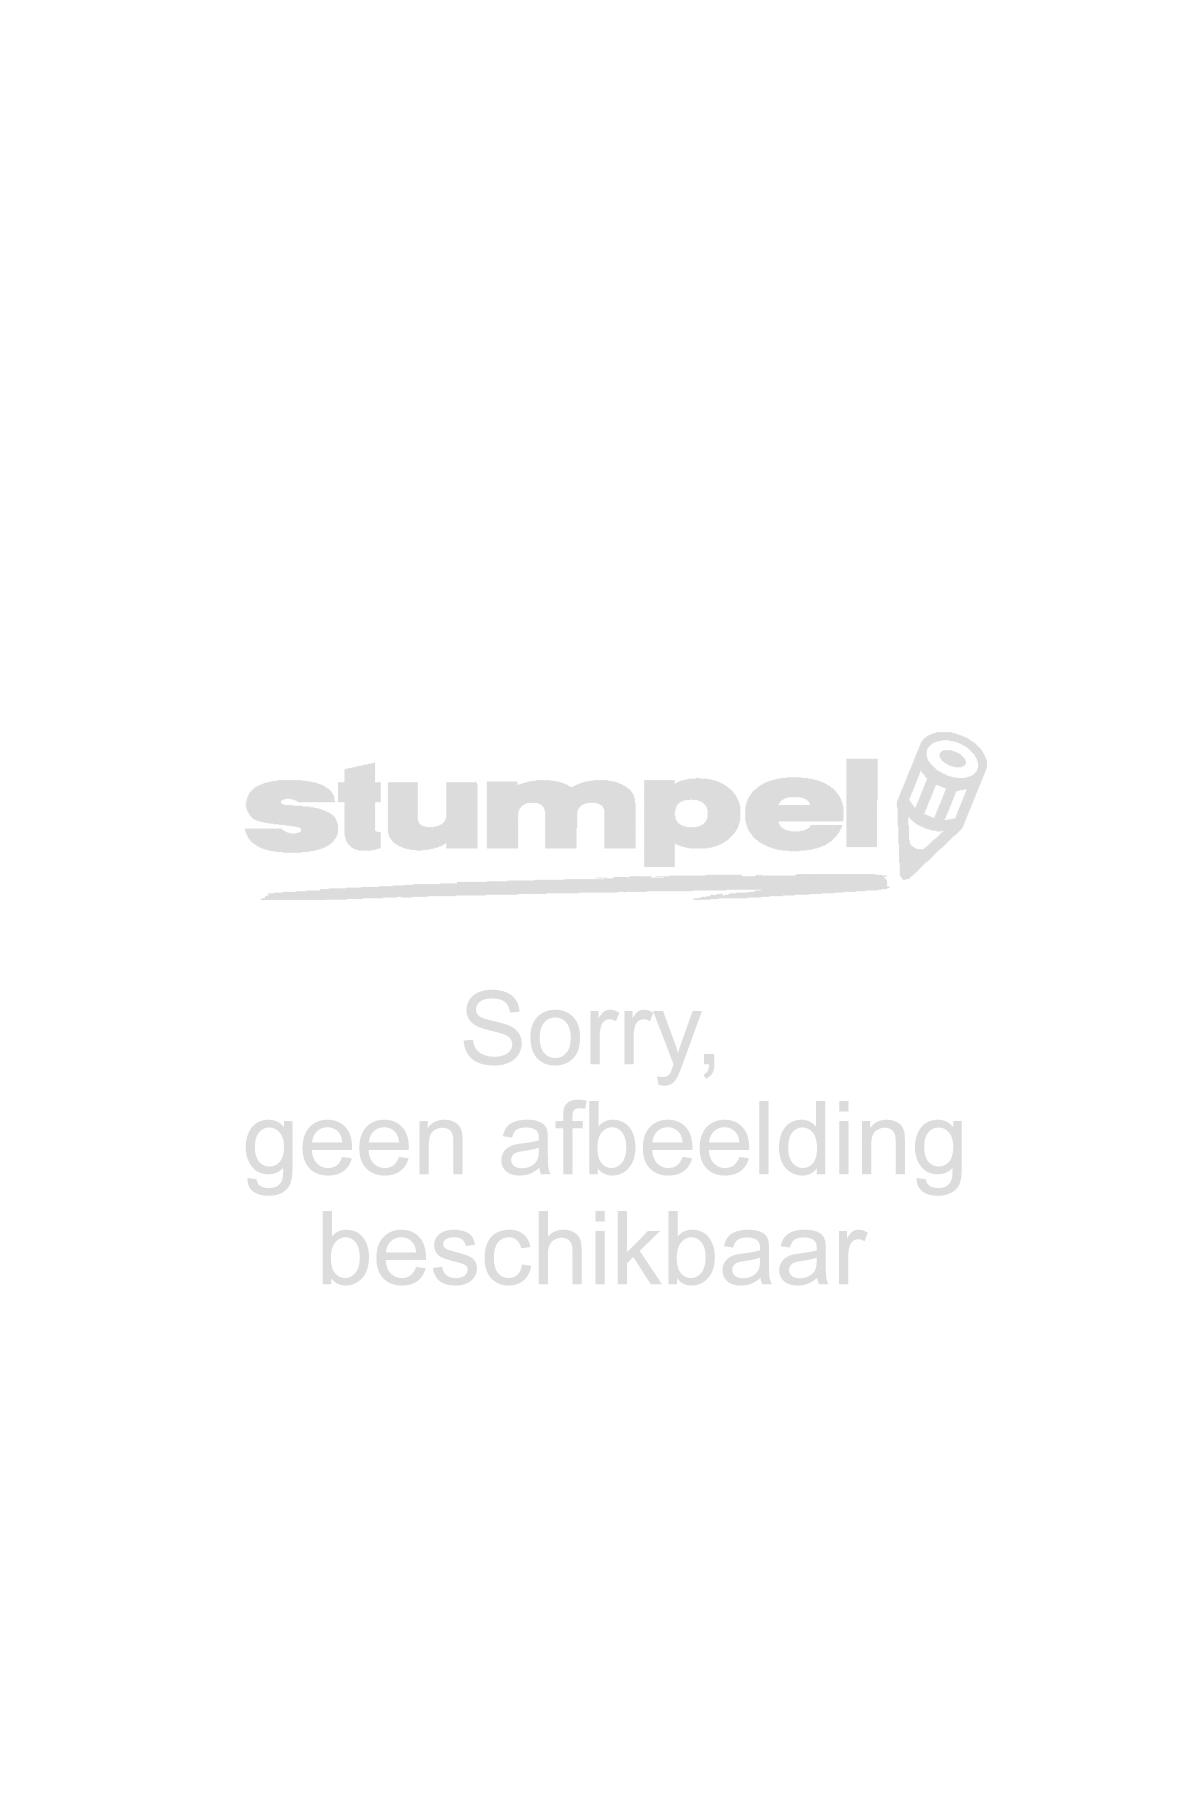 viltstift-bic-1445-pocket-rond-1-1mm-zwart-635651